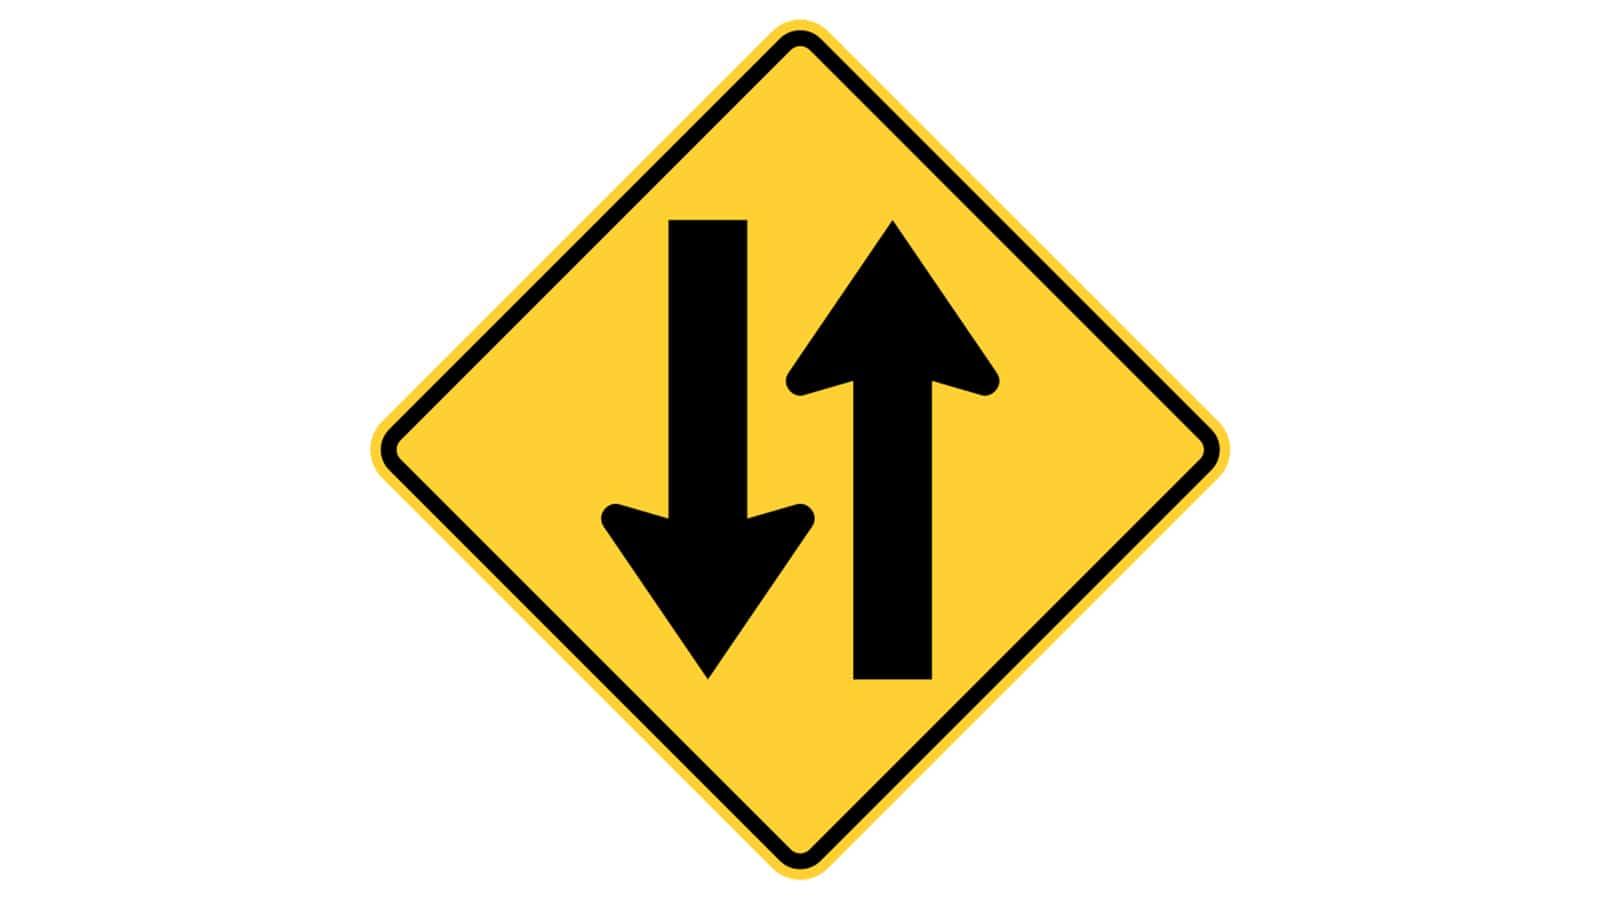 Warning sign Two-Way Traffic